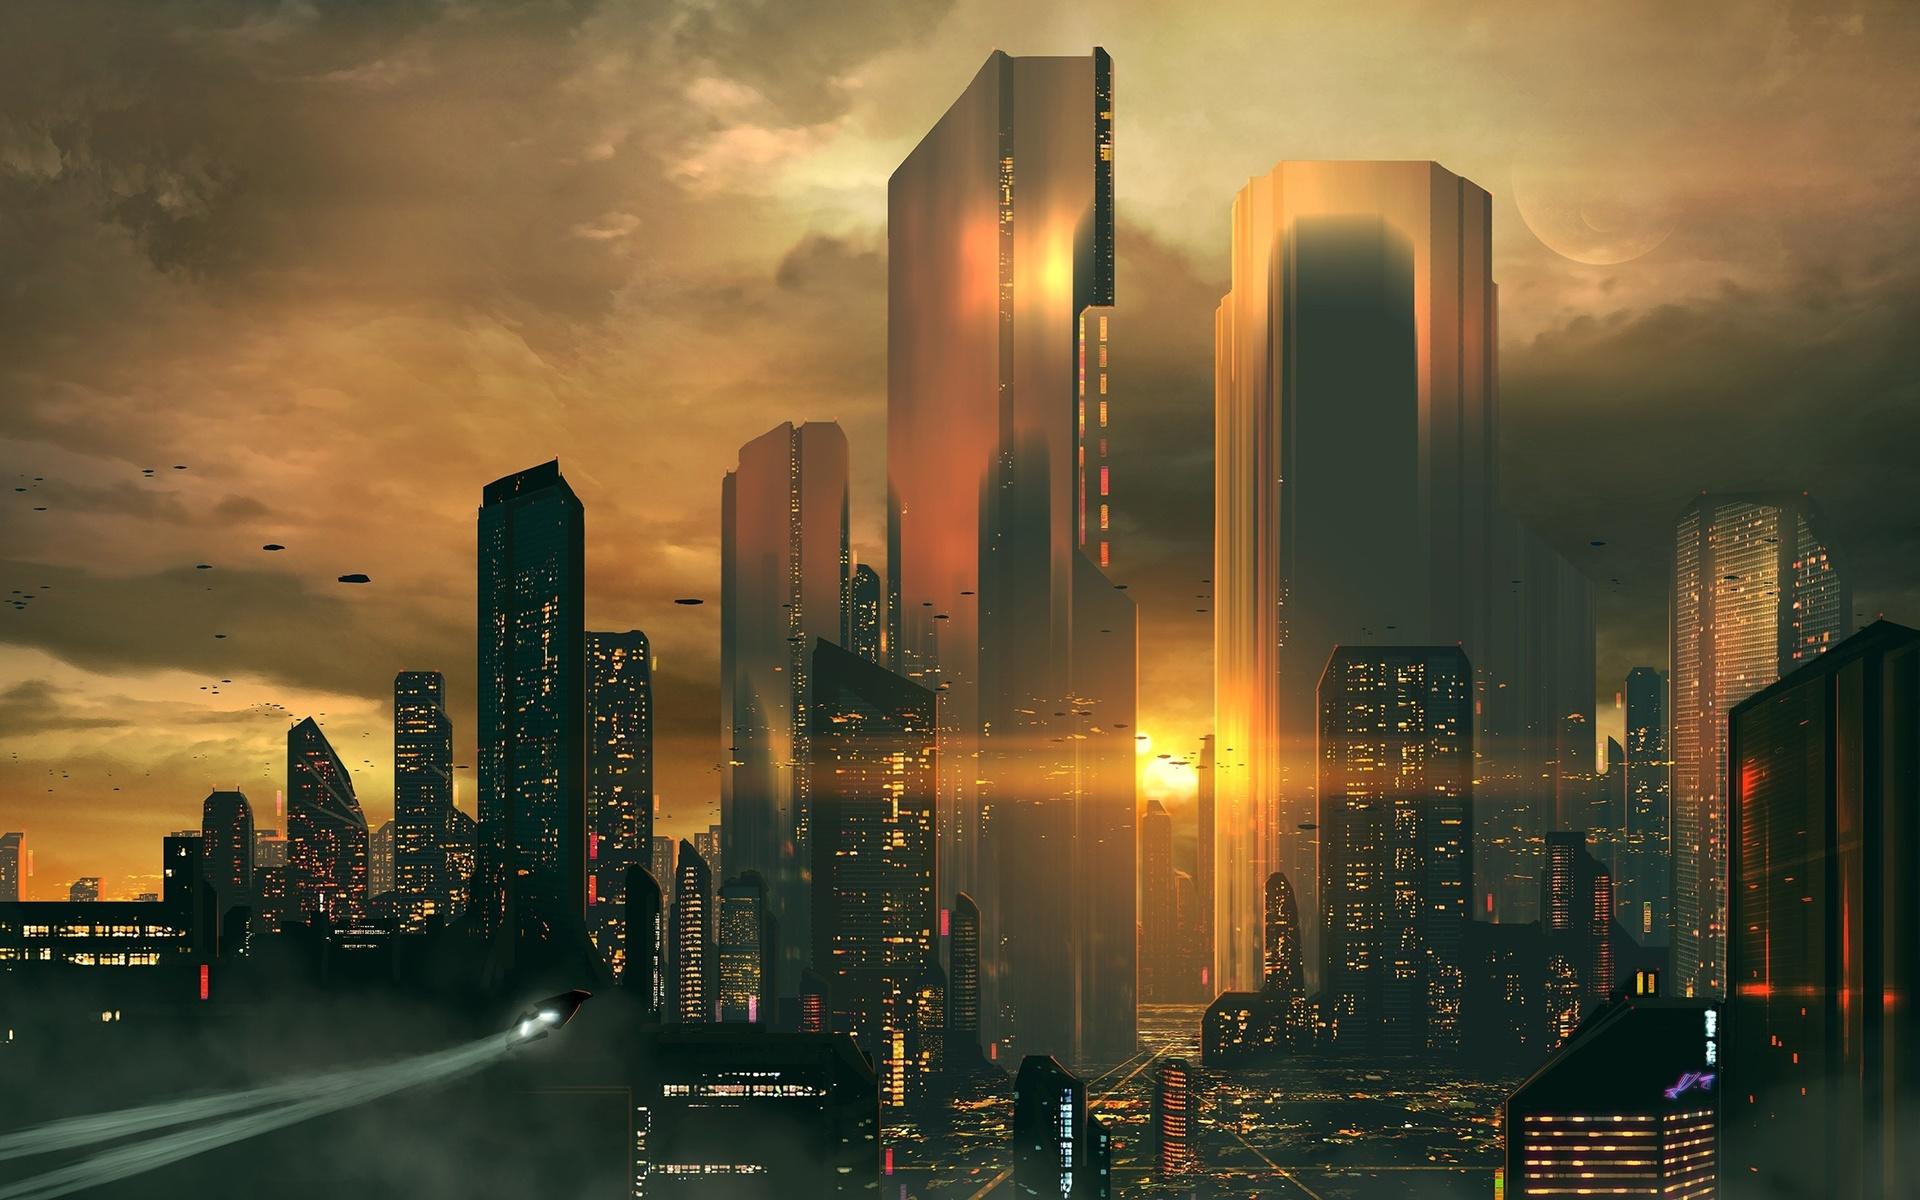 futuristic cityscape, skyscrapers, sunset